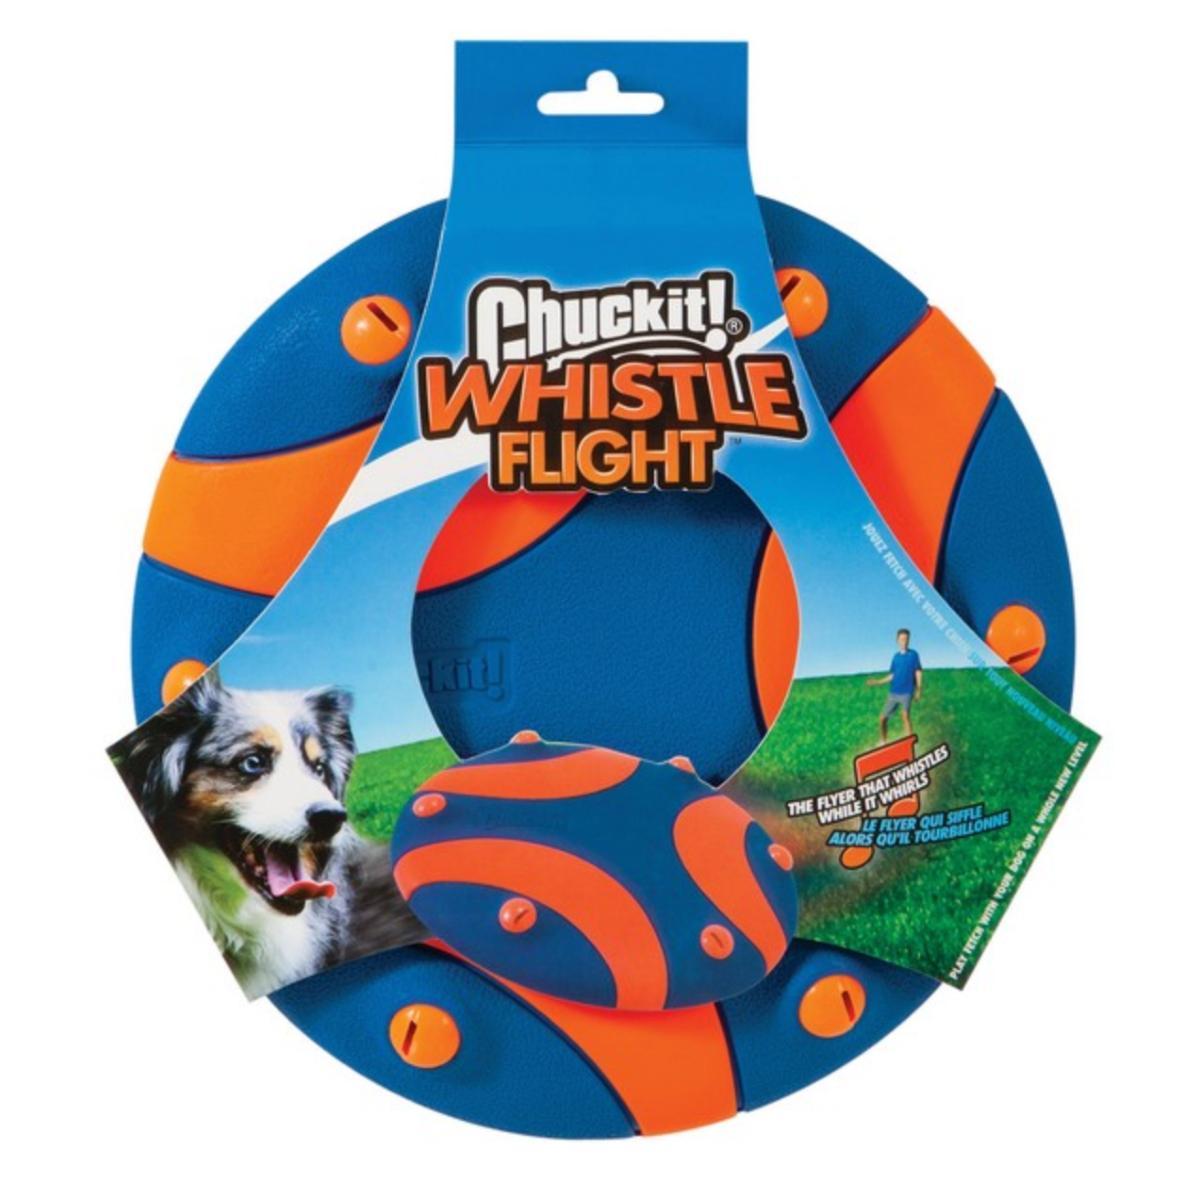 Chuckit! Whistle Flight 28cm